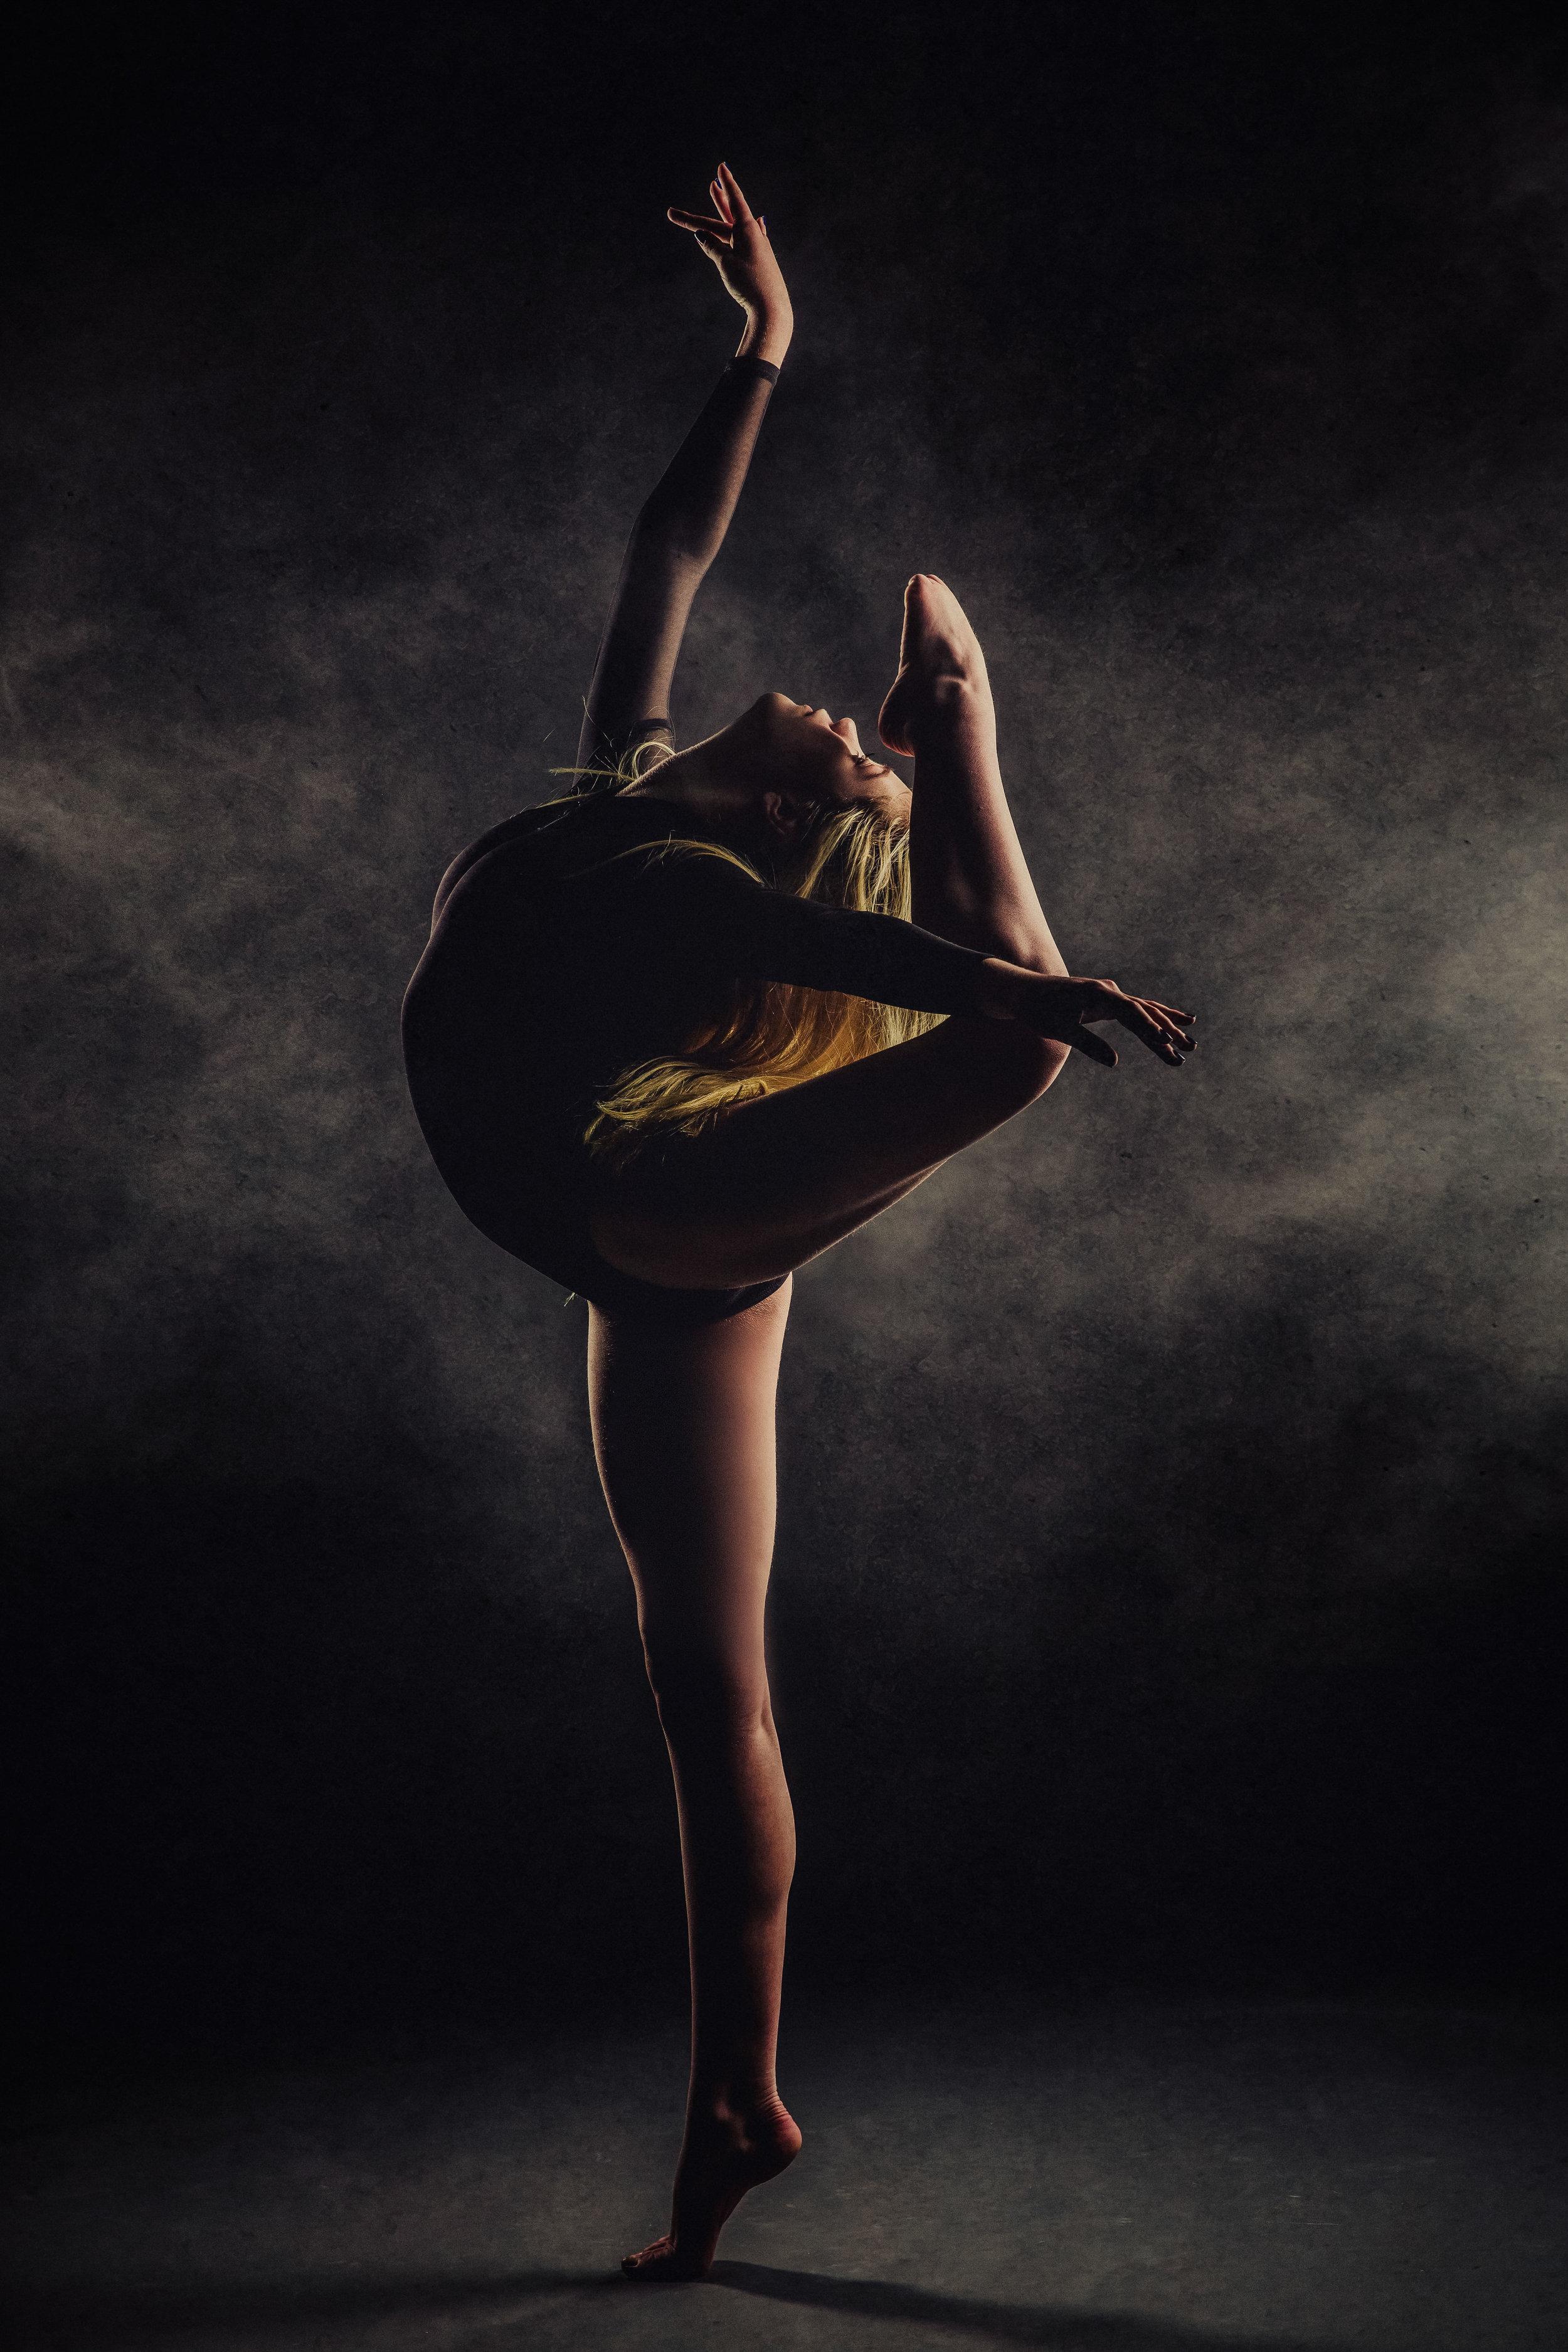 Dancing-In-Light.jpg